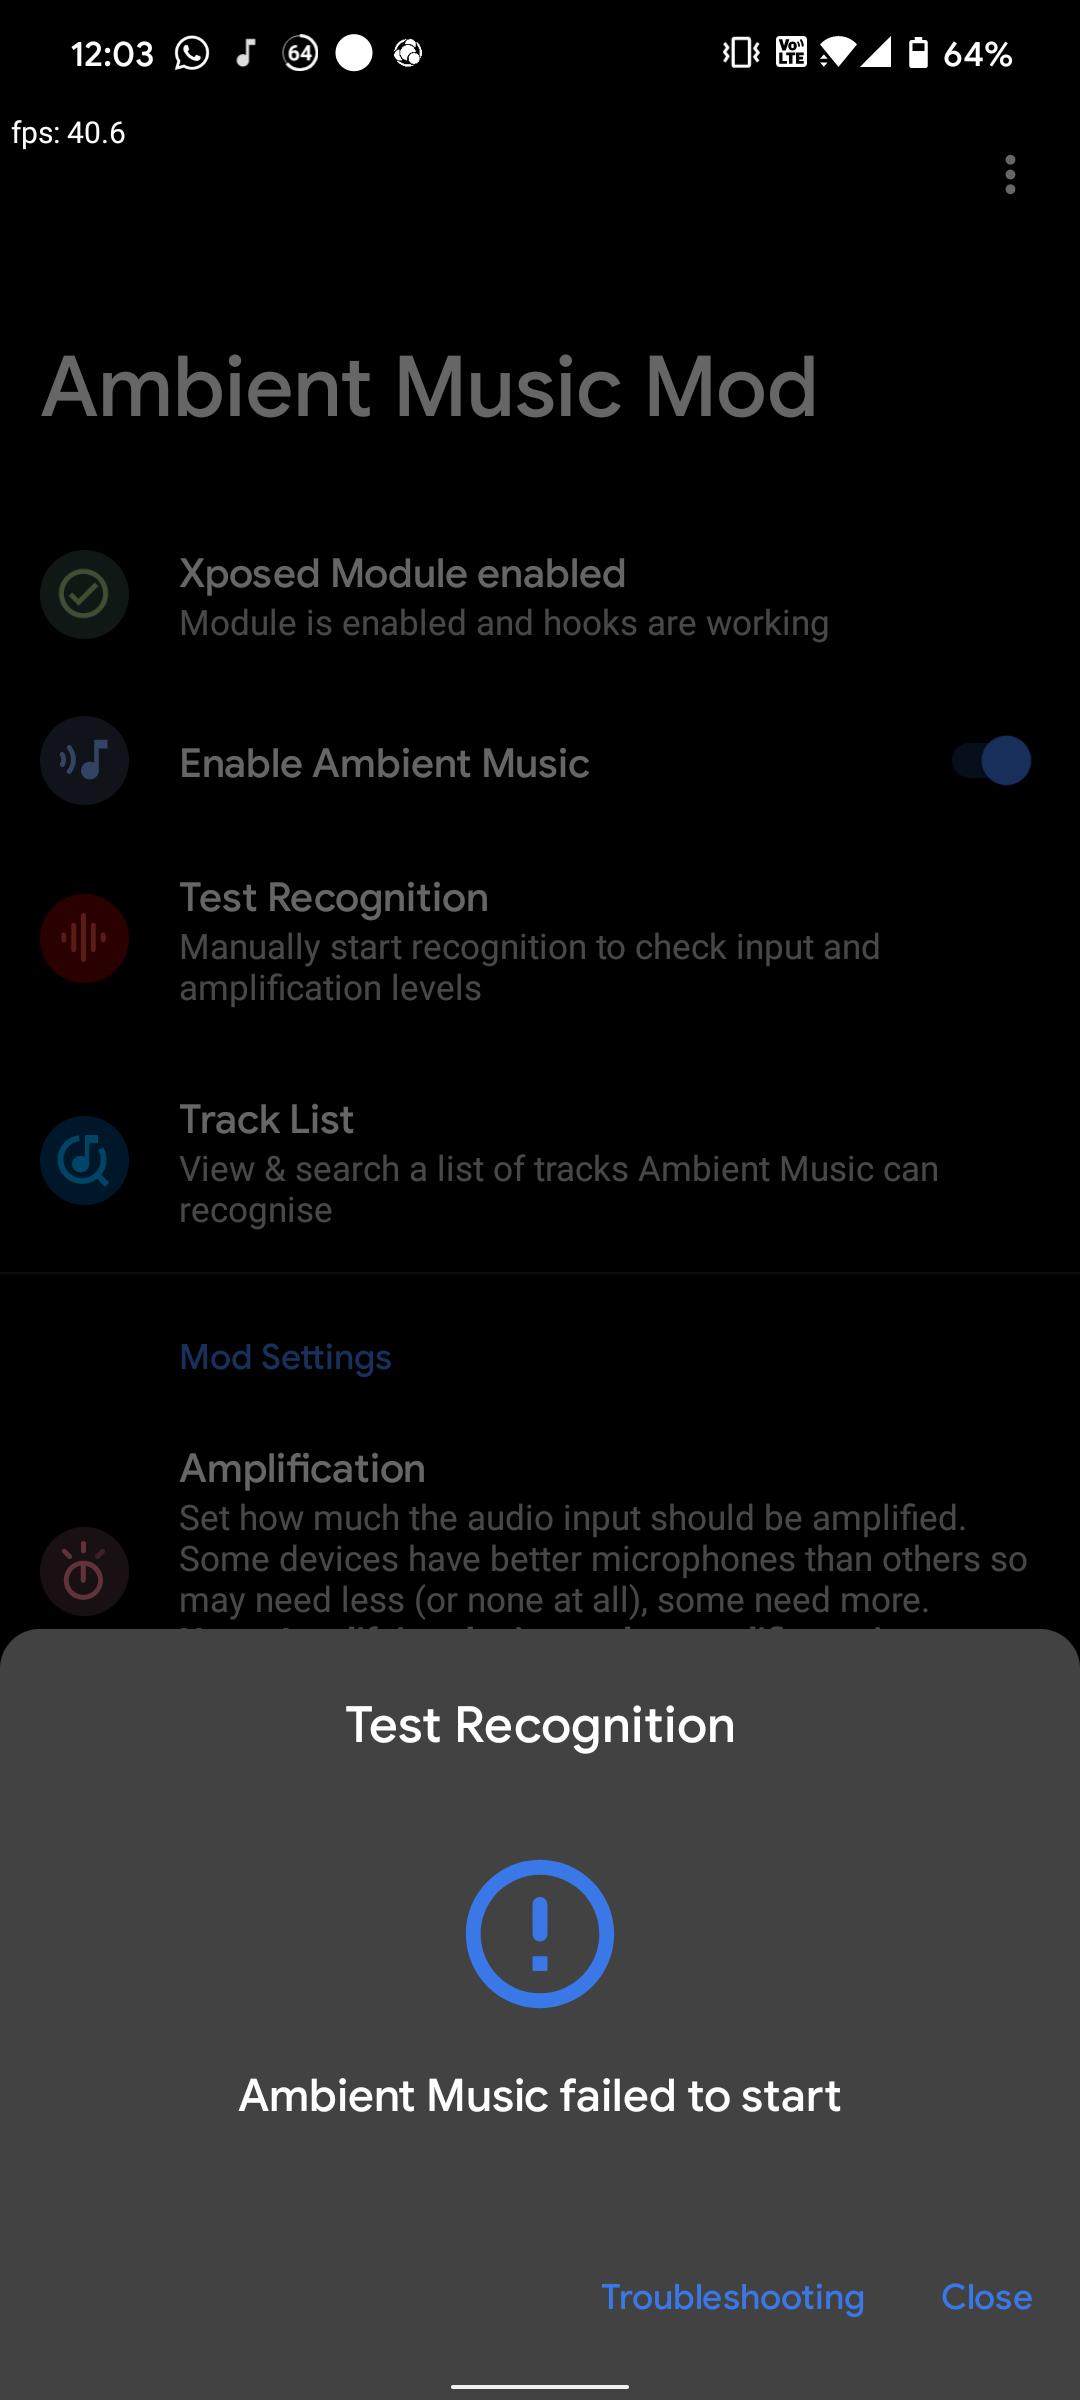 Screenshot_20210805-120314_Ambient_Music_Mod.png